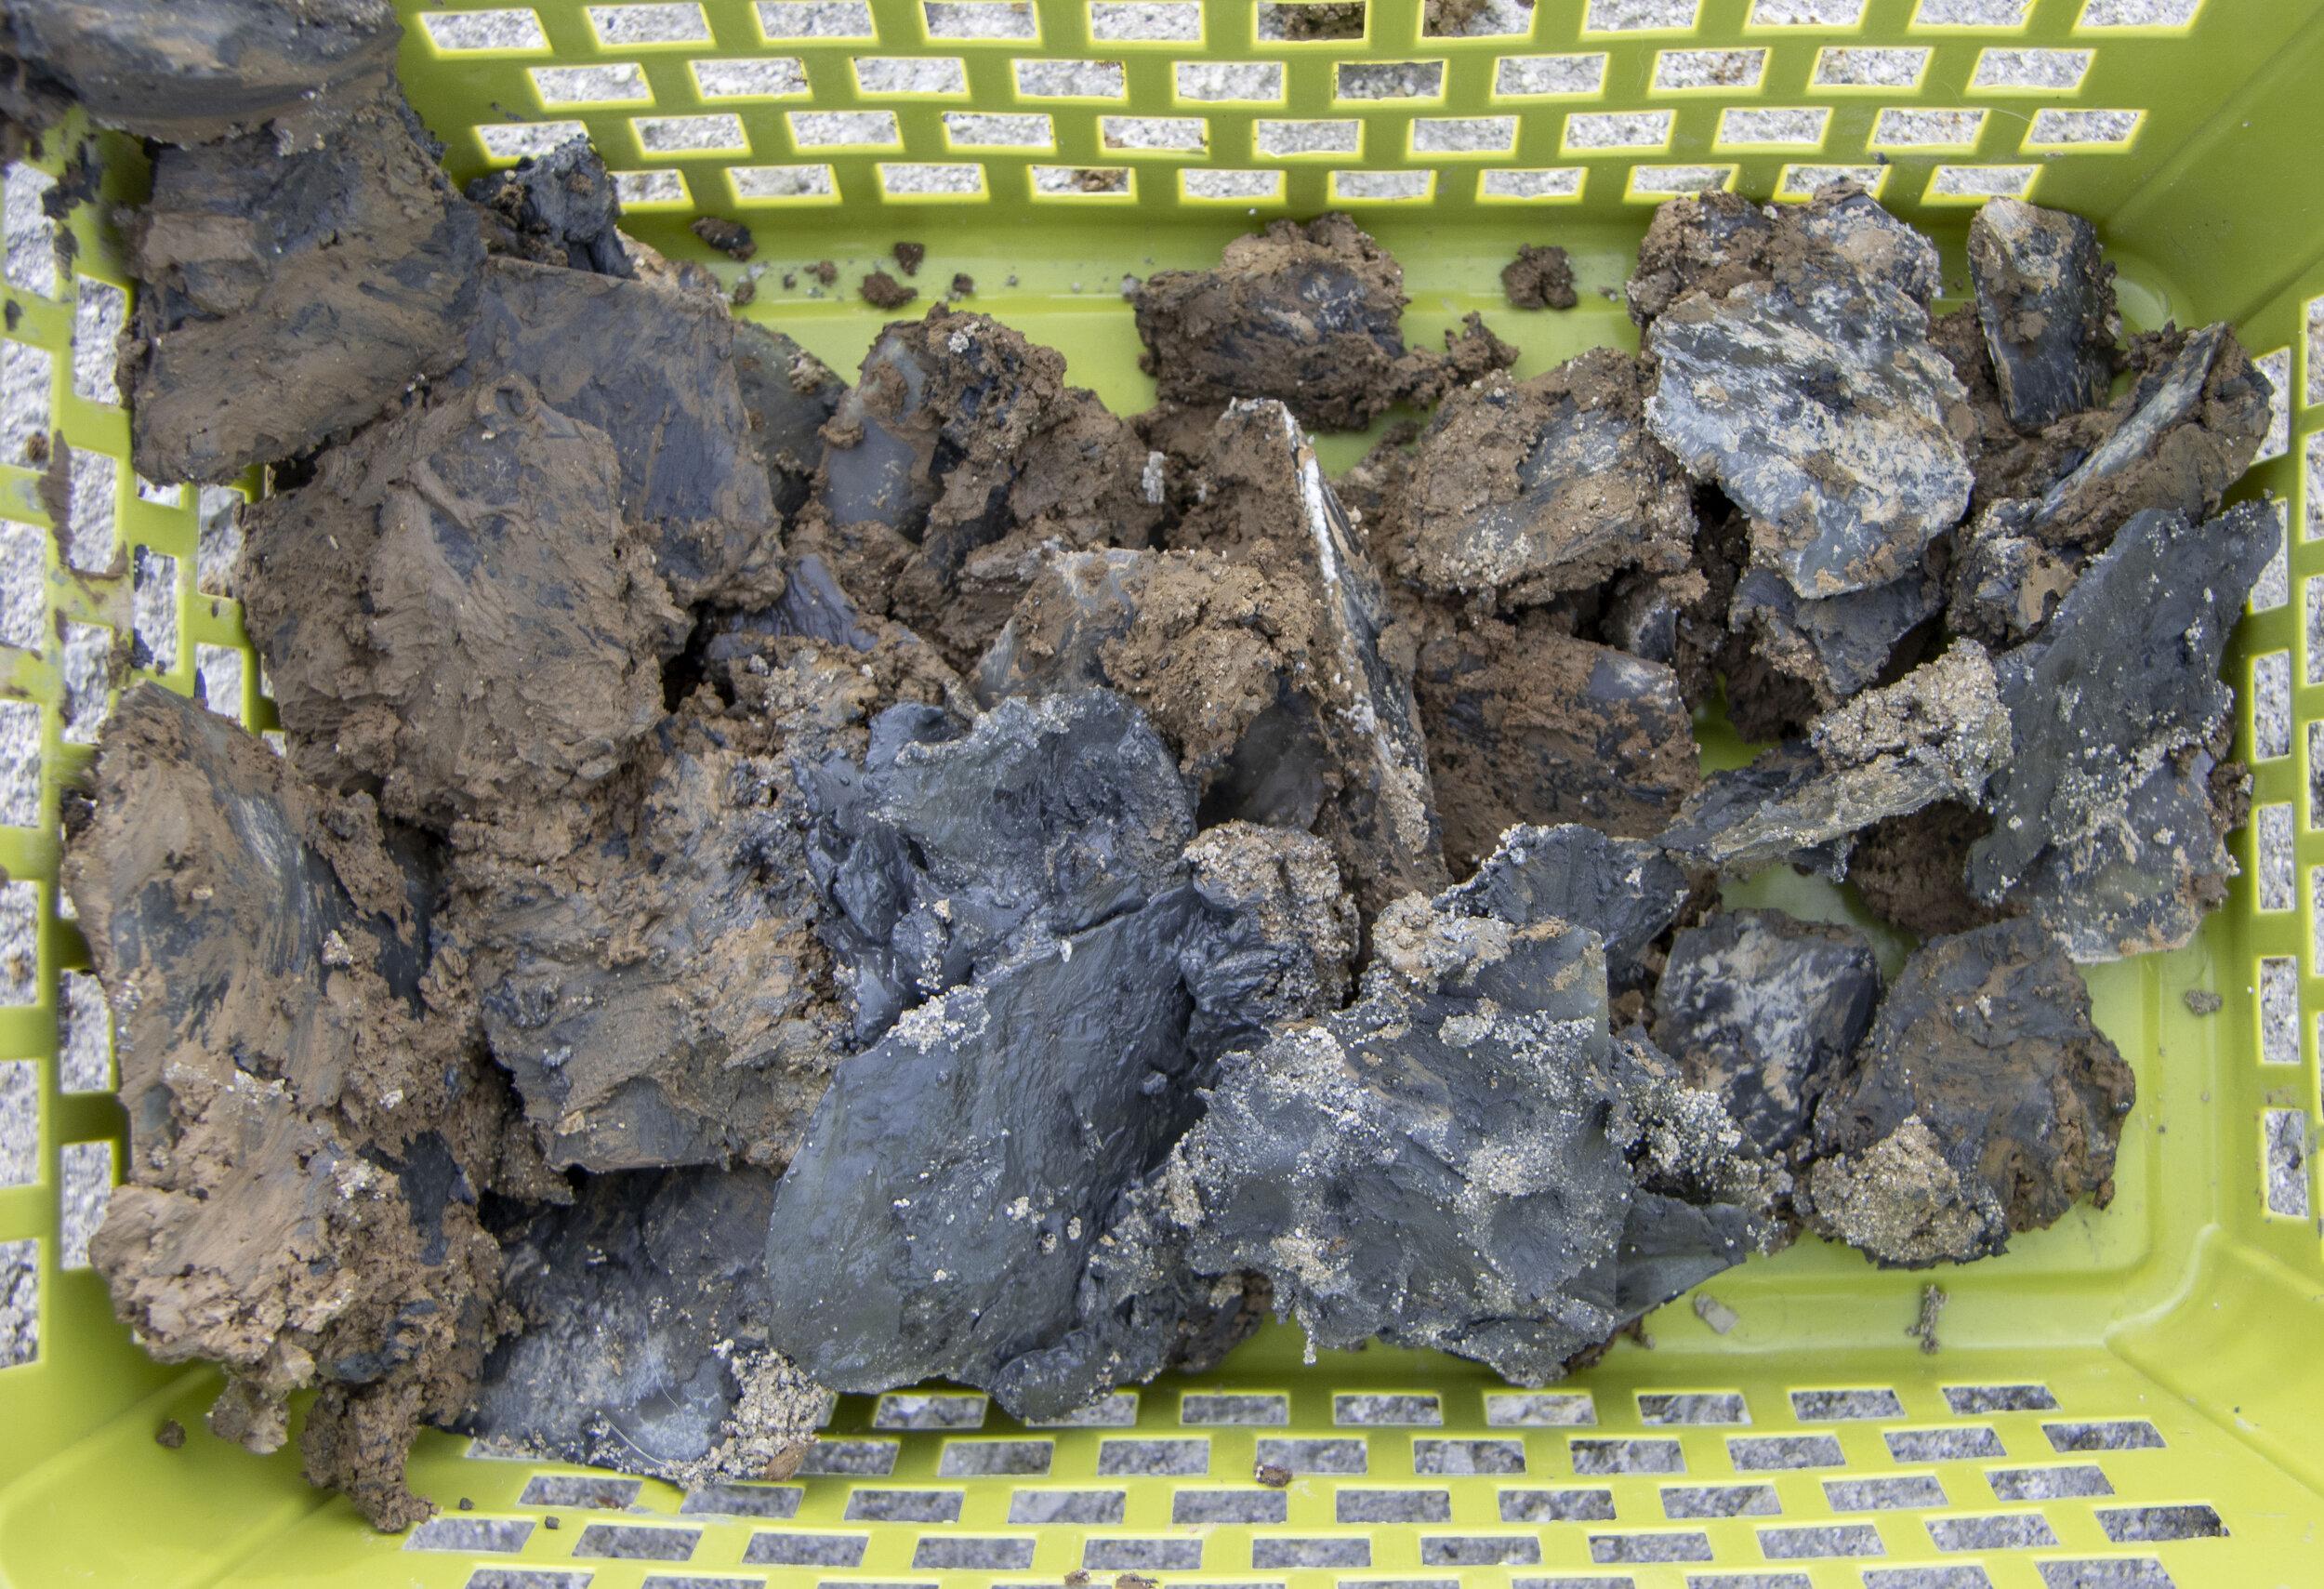 freshly harvested selenite crystals